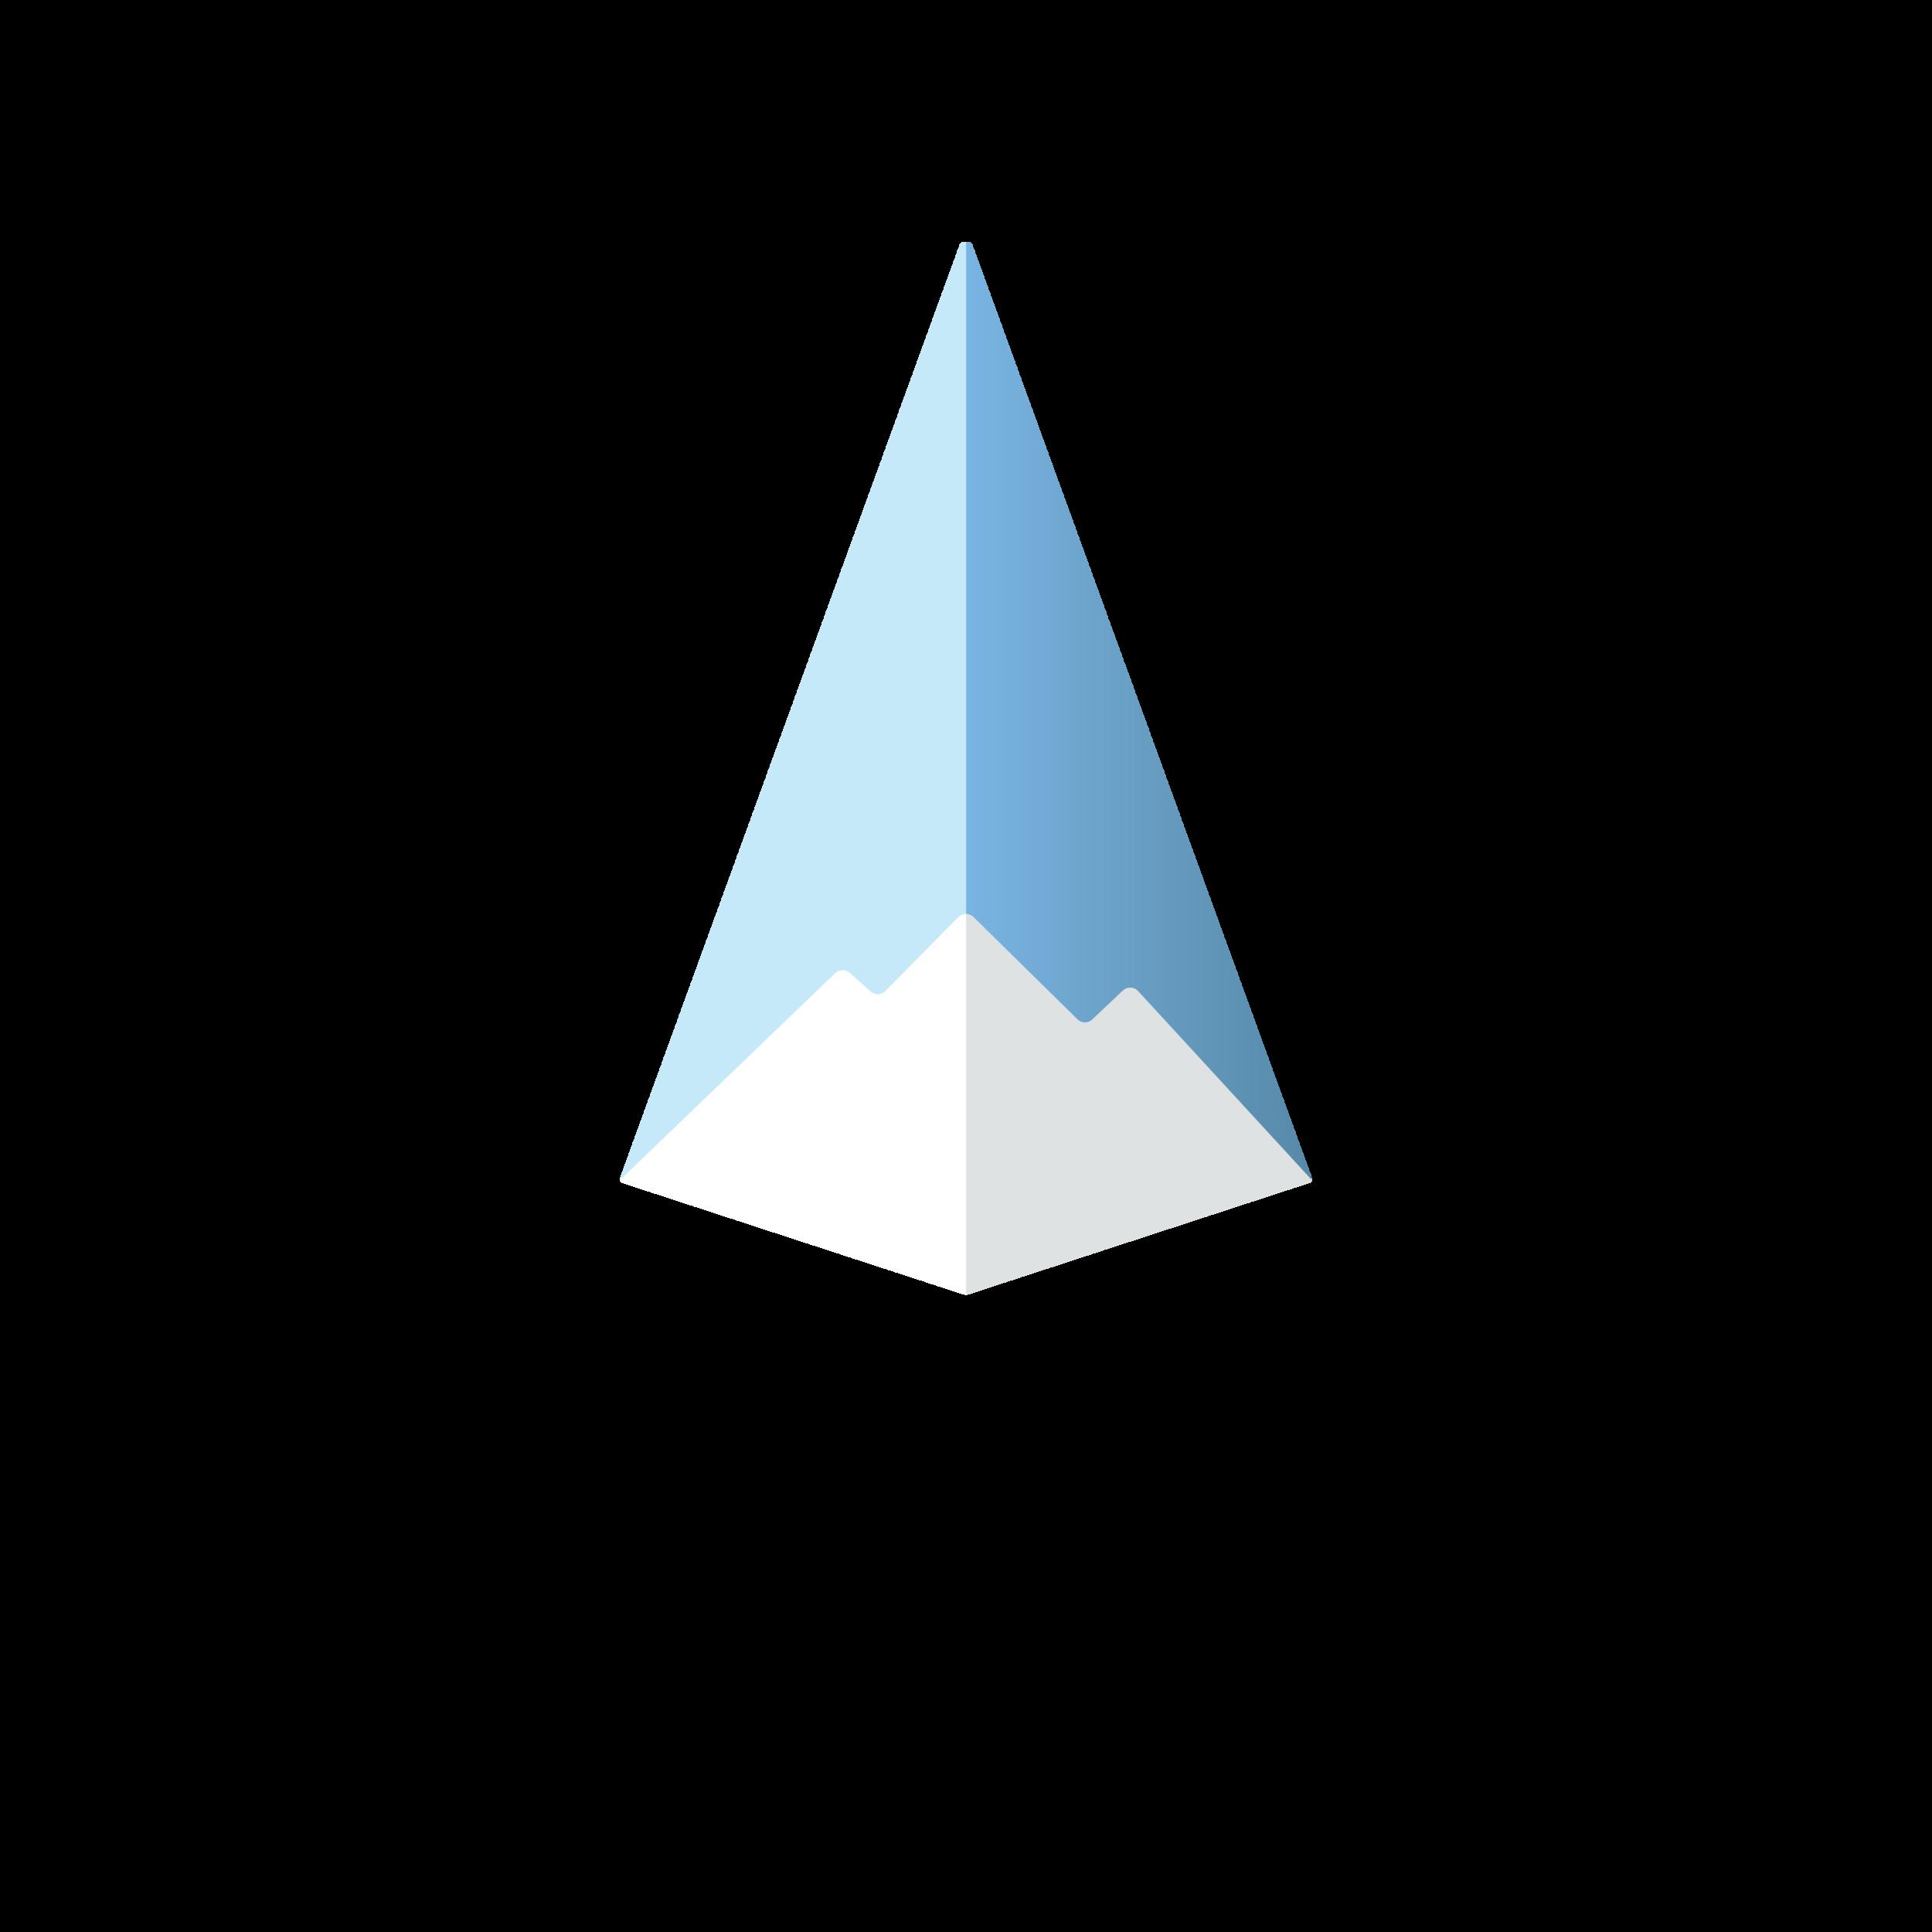 boonmaps-logo-black-text.png